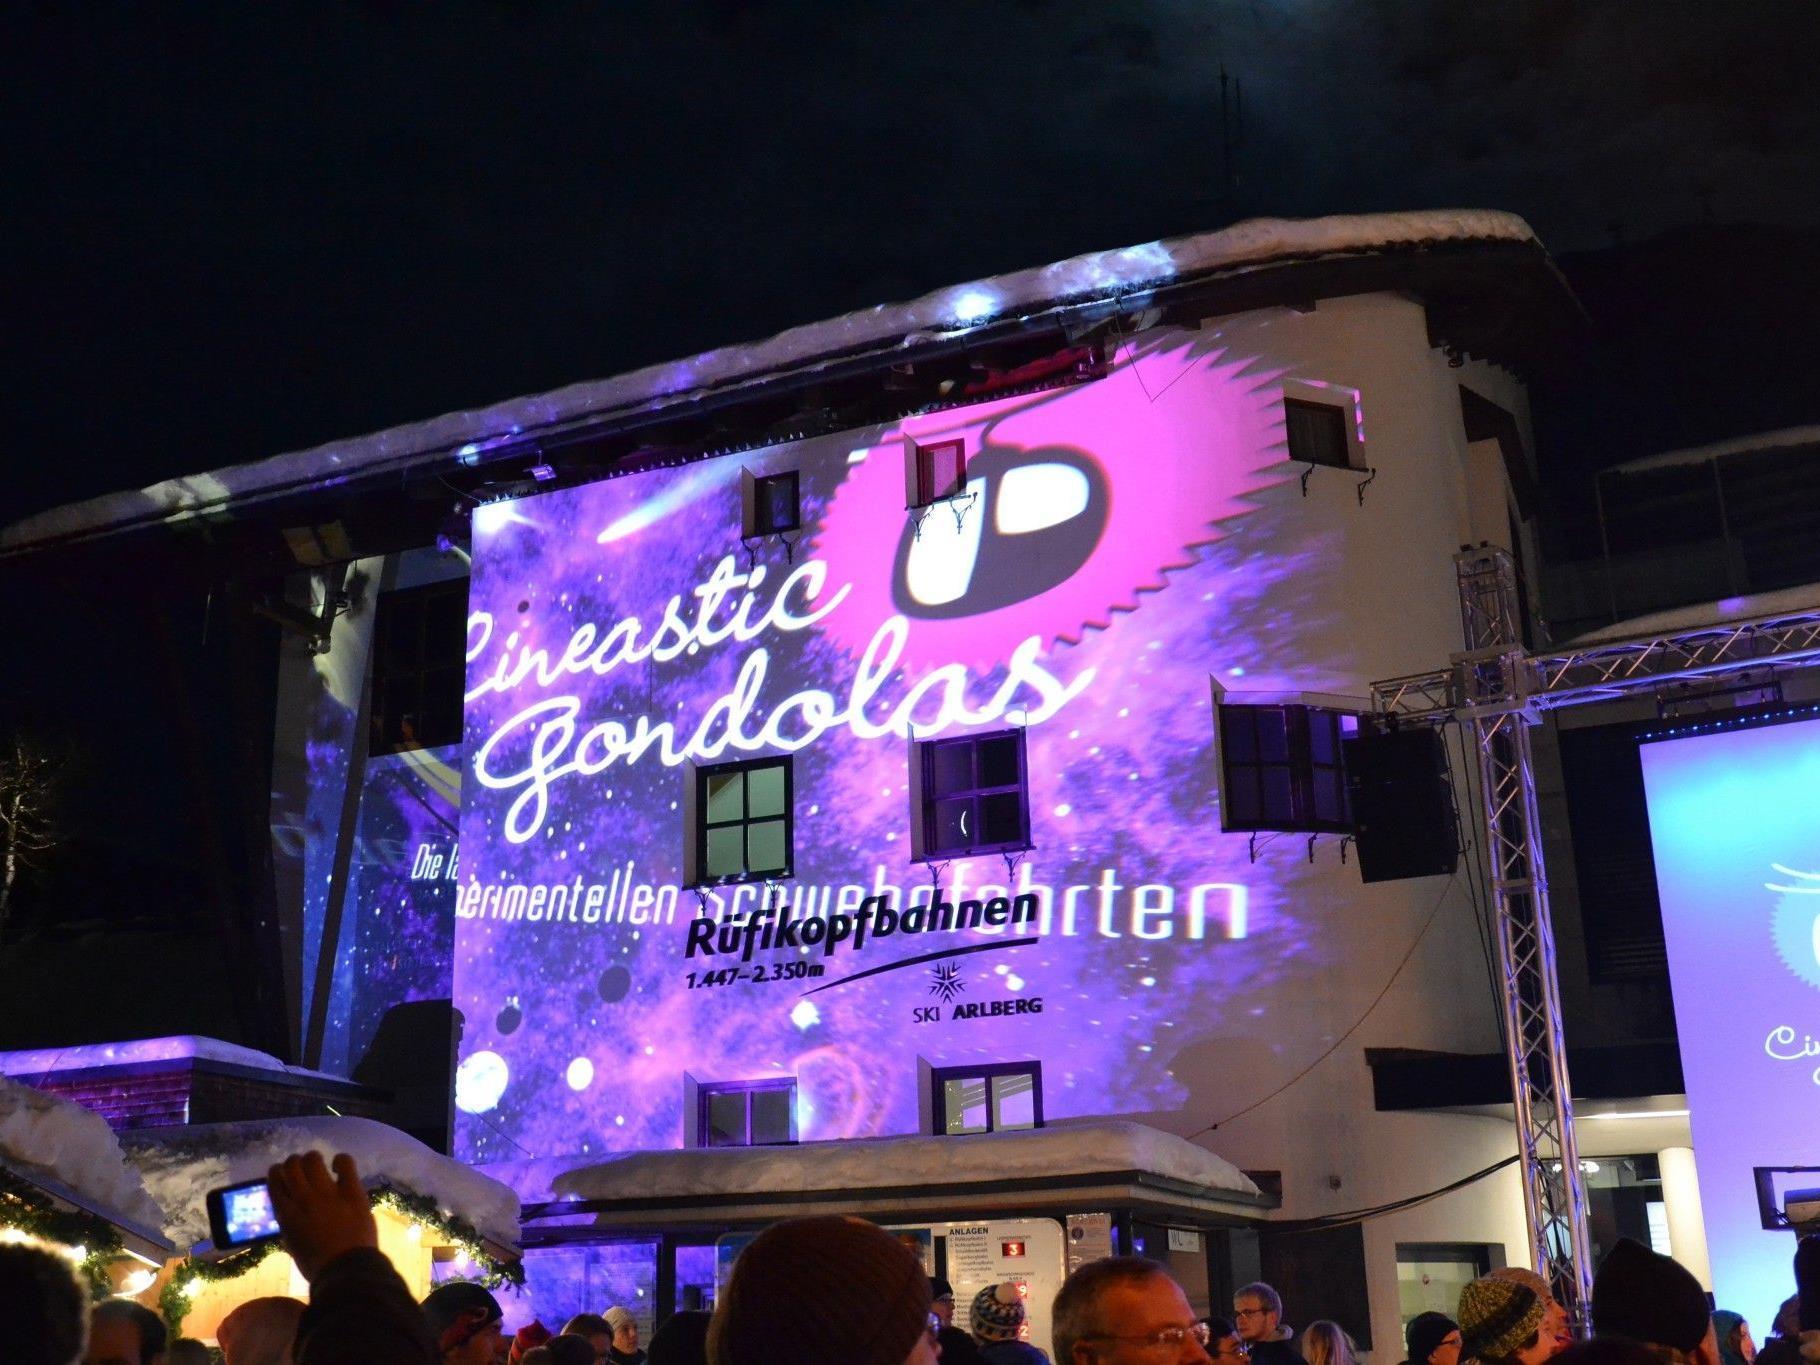 Gondelkino, Visual Arts und DJs am 8. Dezember in der Rüfikopfbahn